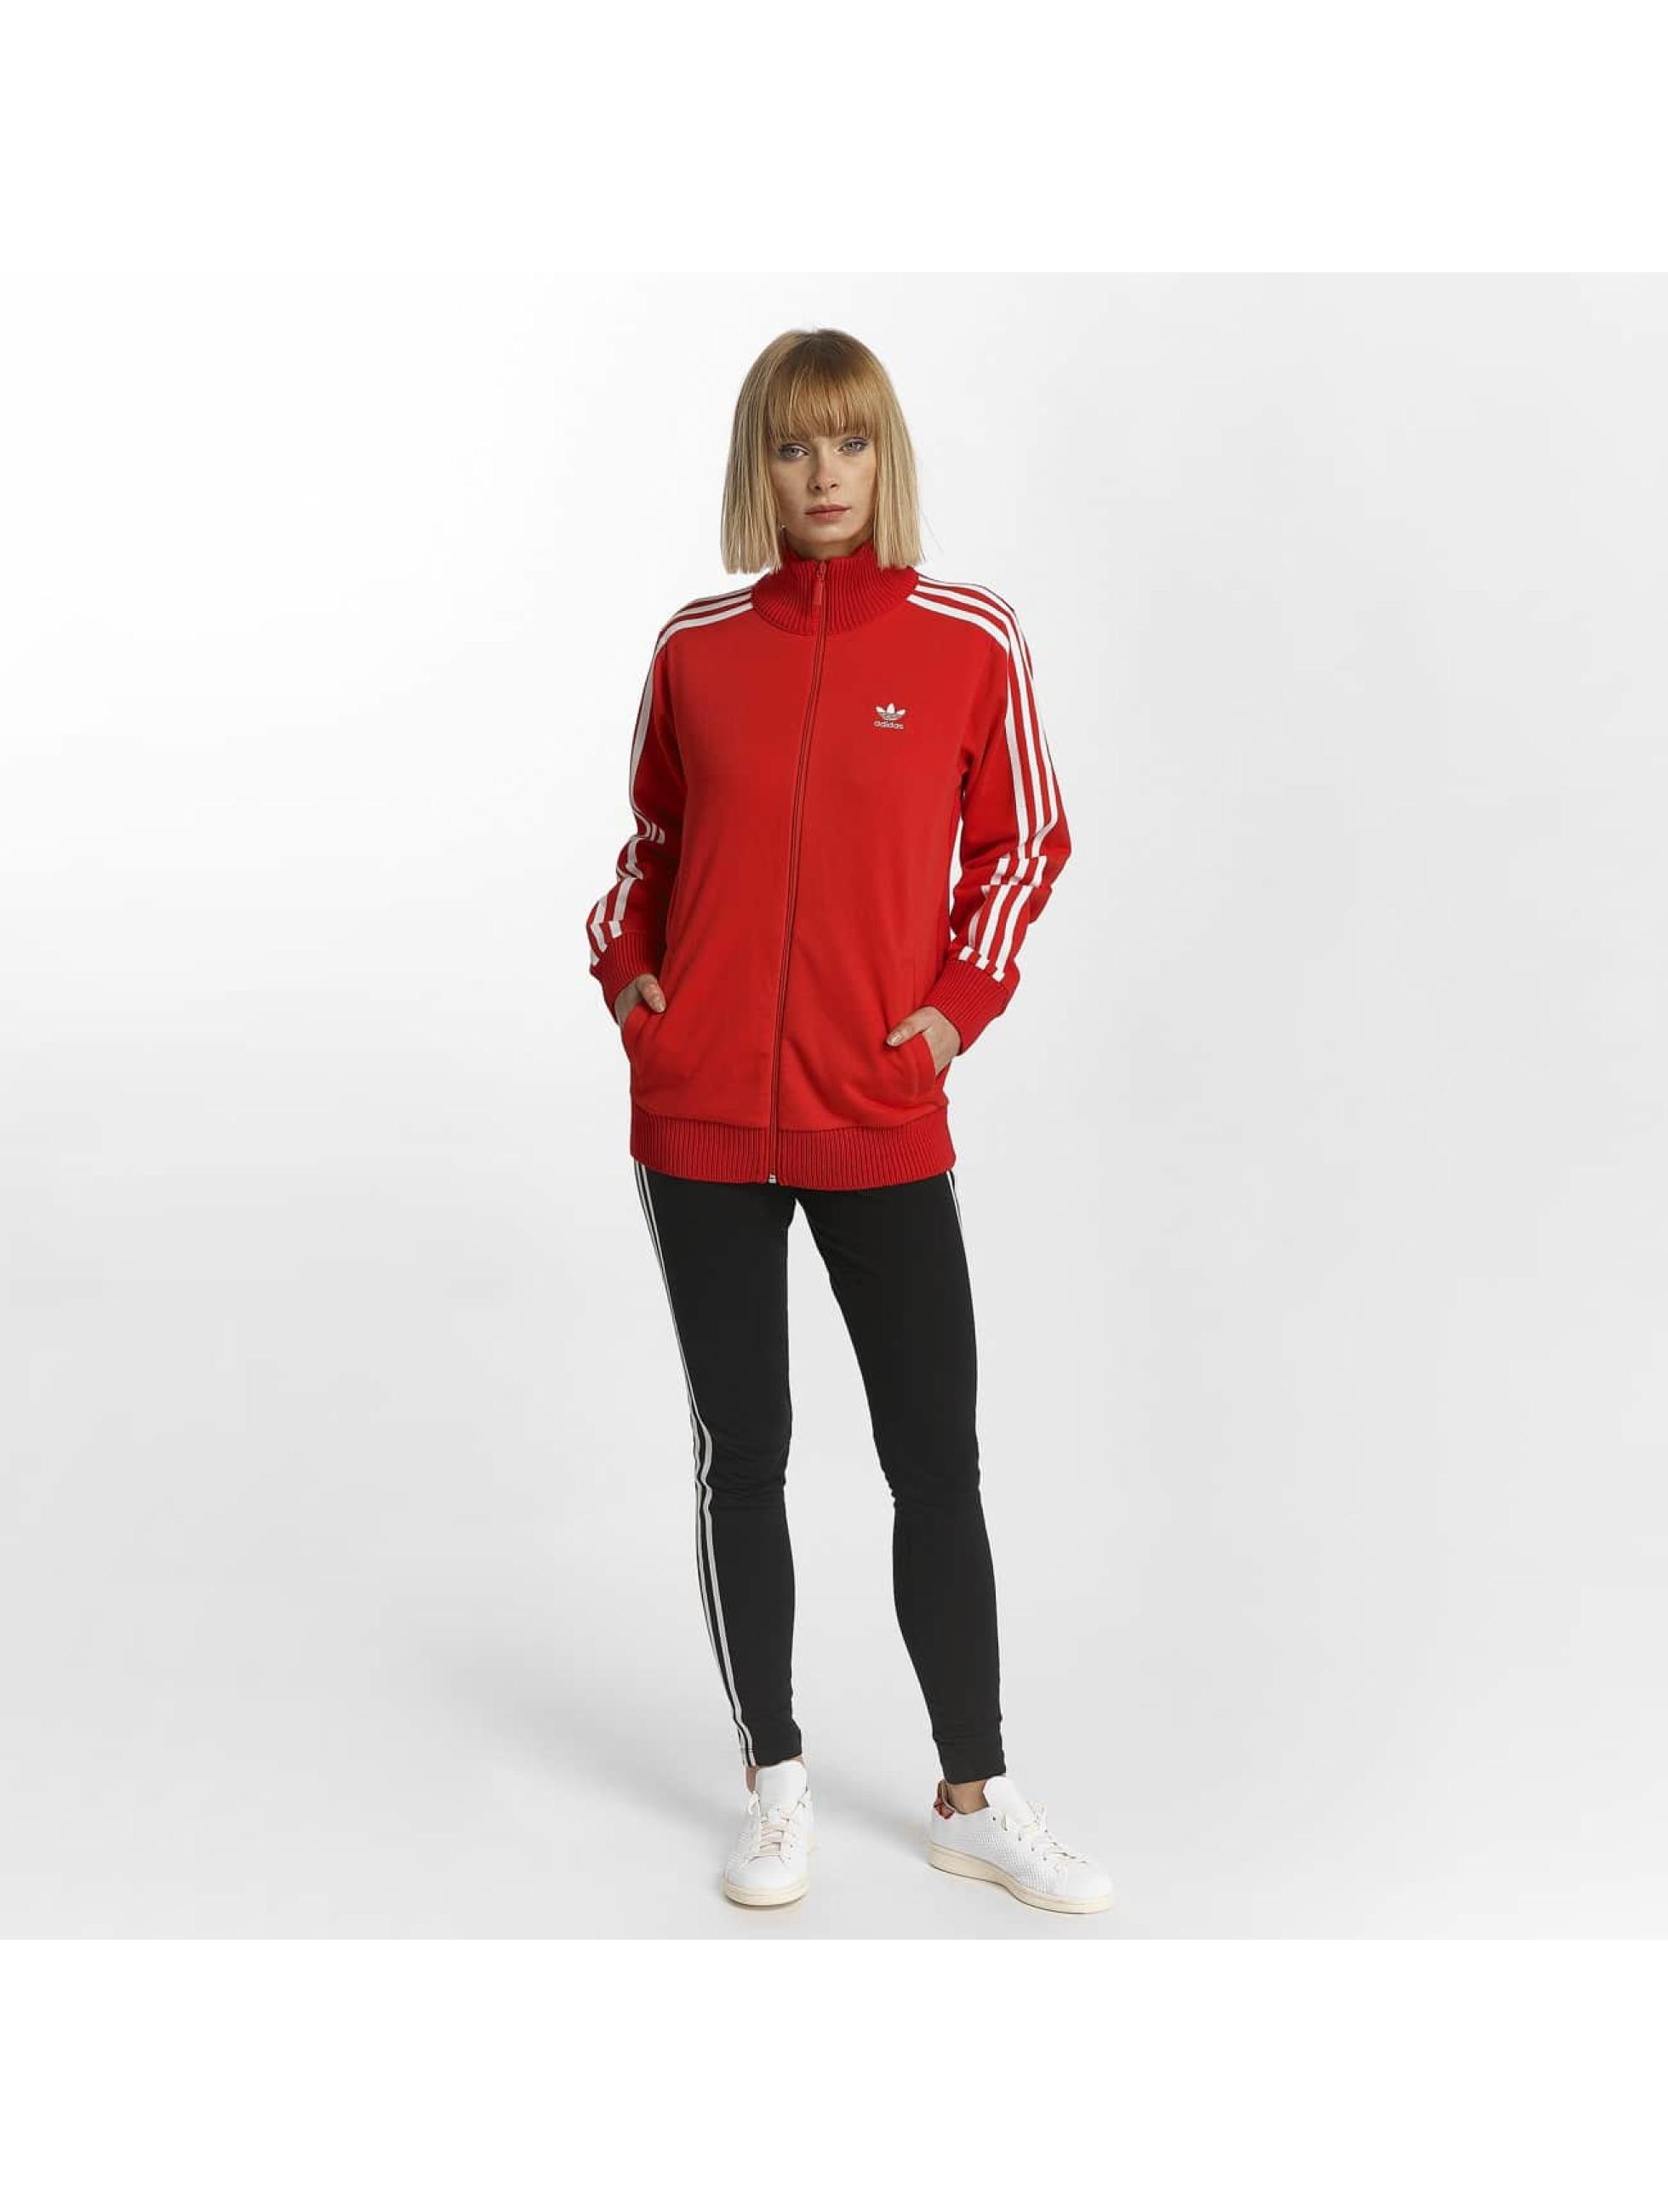 adidas originals Välikausitakit Originals Track Top punainen